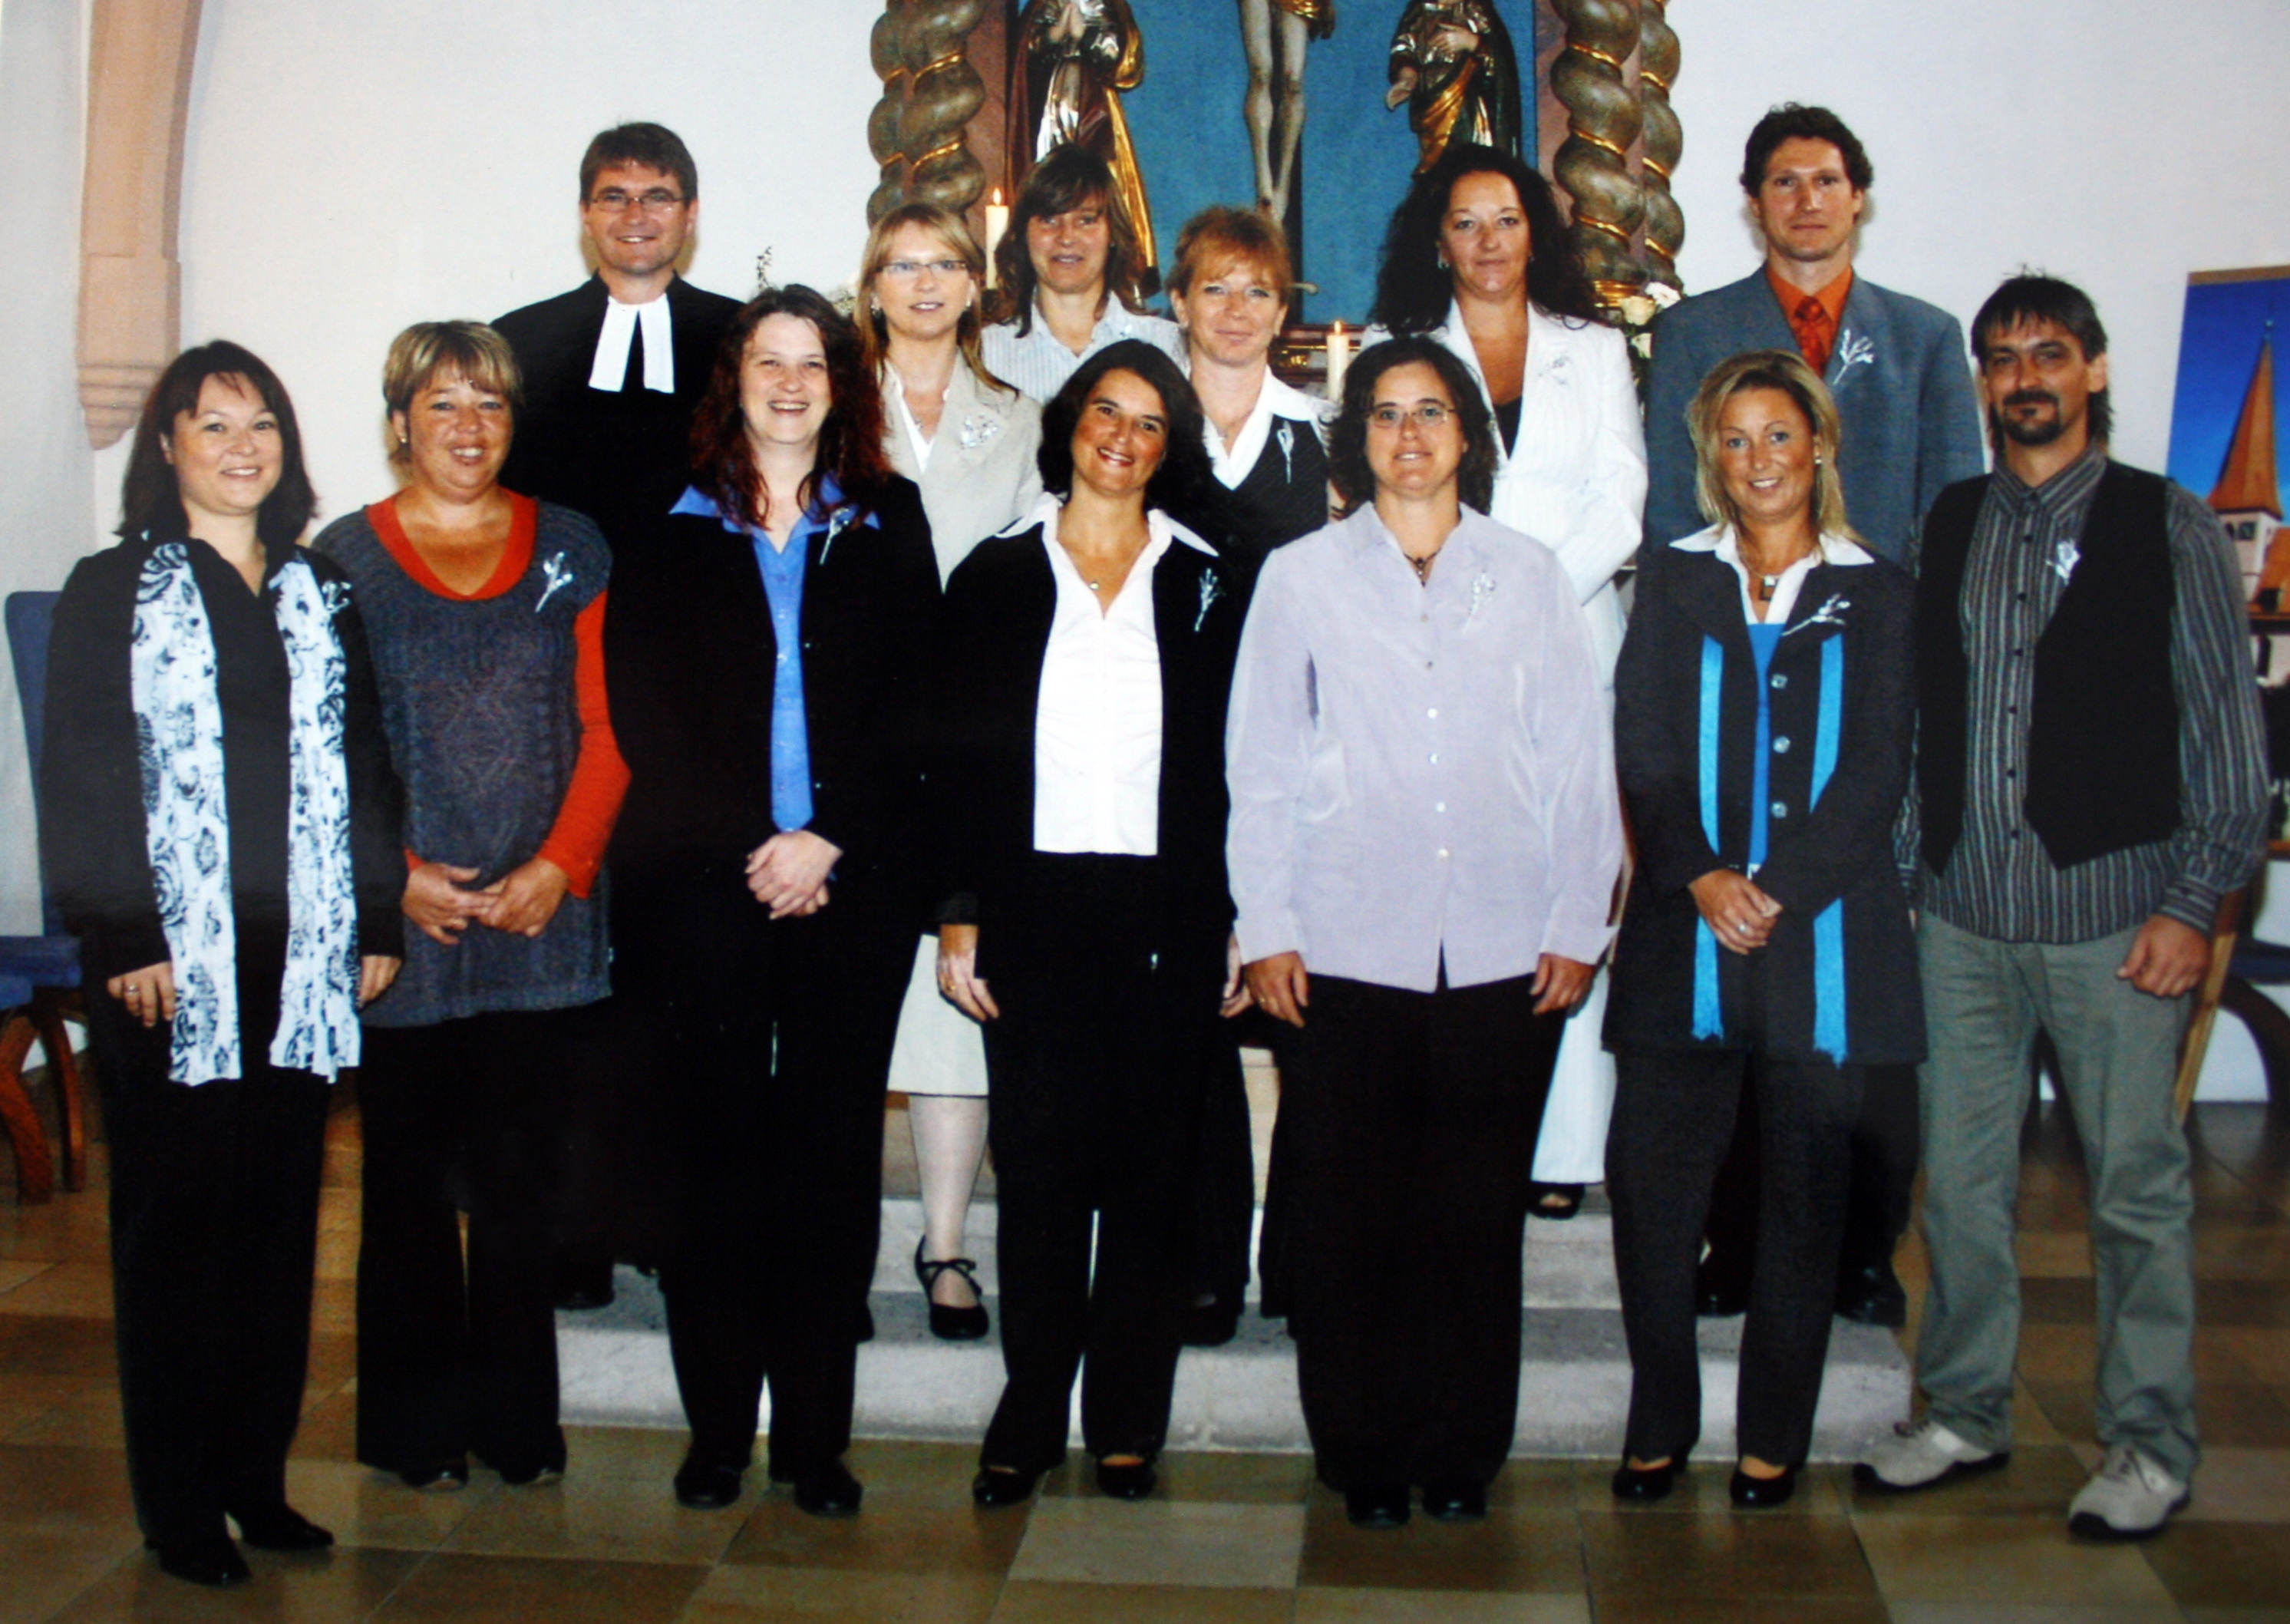 Silberne Konfirmation 2009